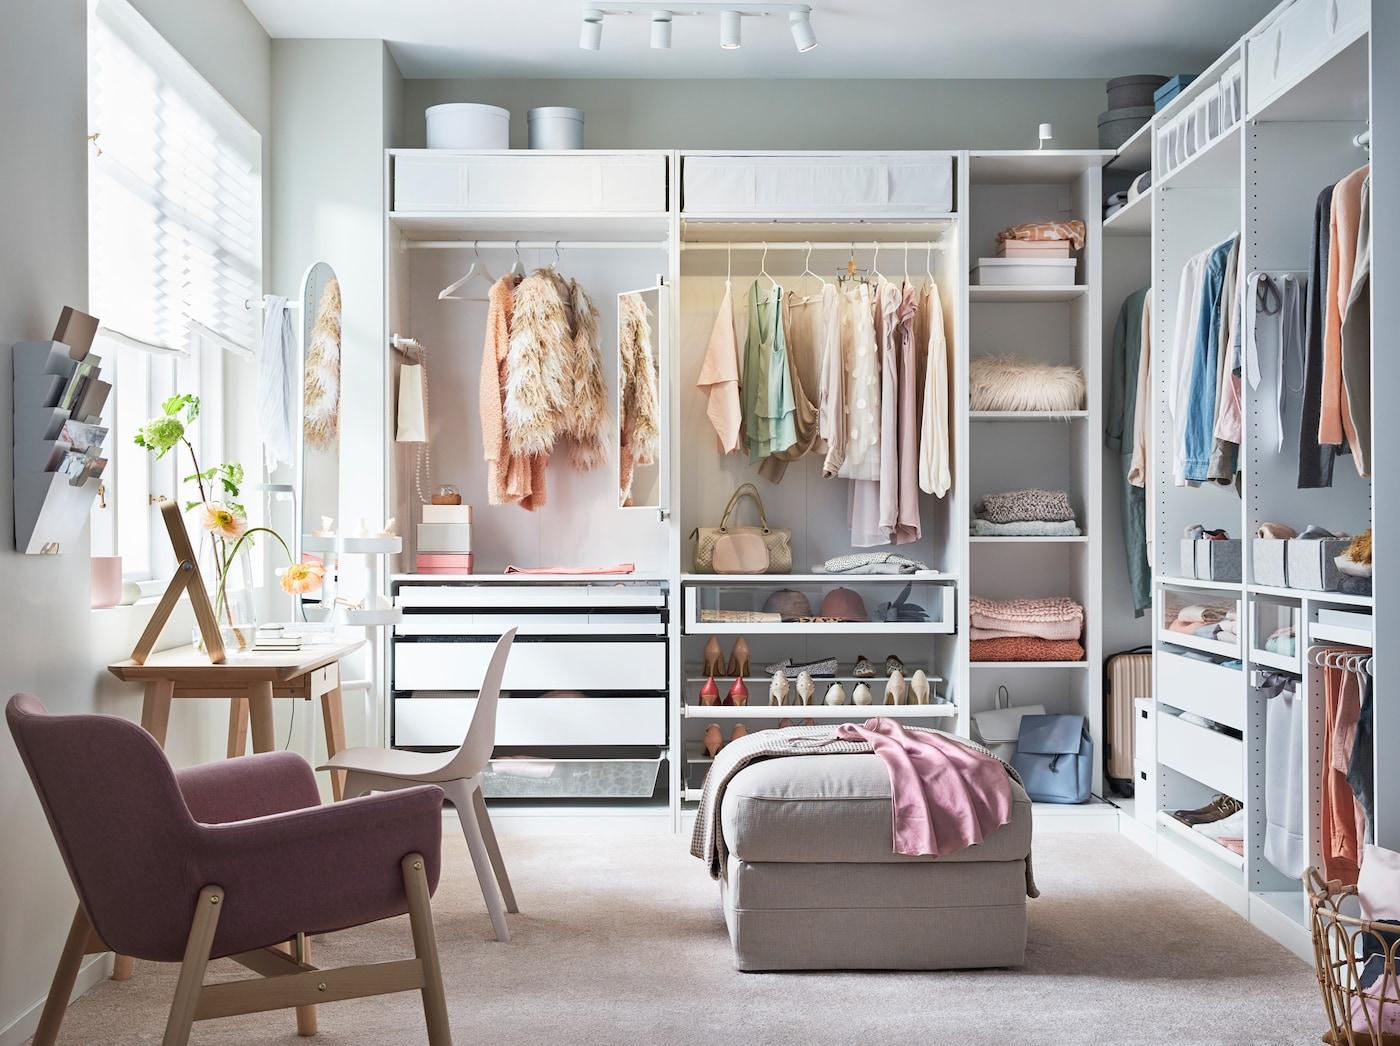 Plan your dream walk-in closet - IKEA